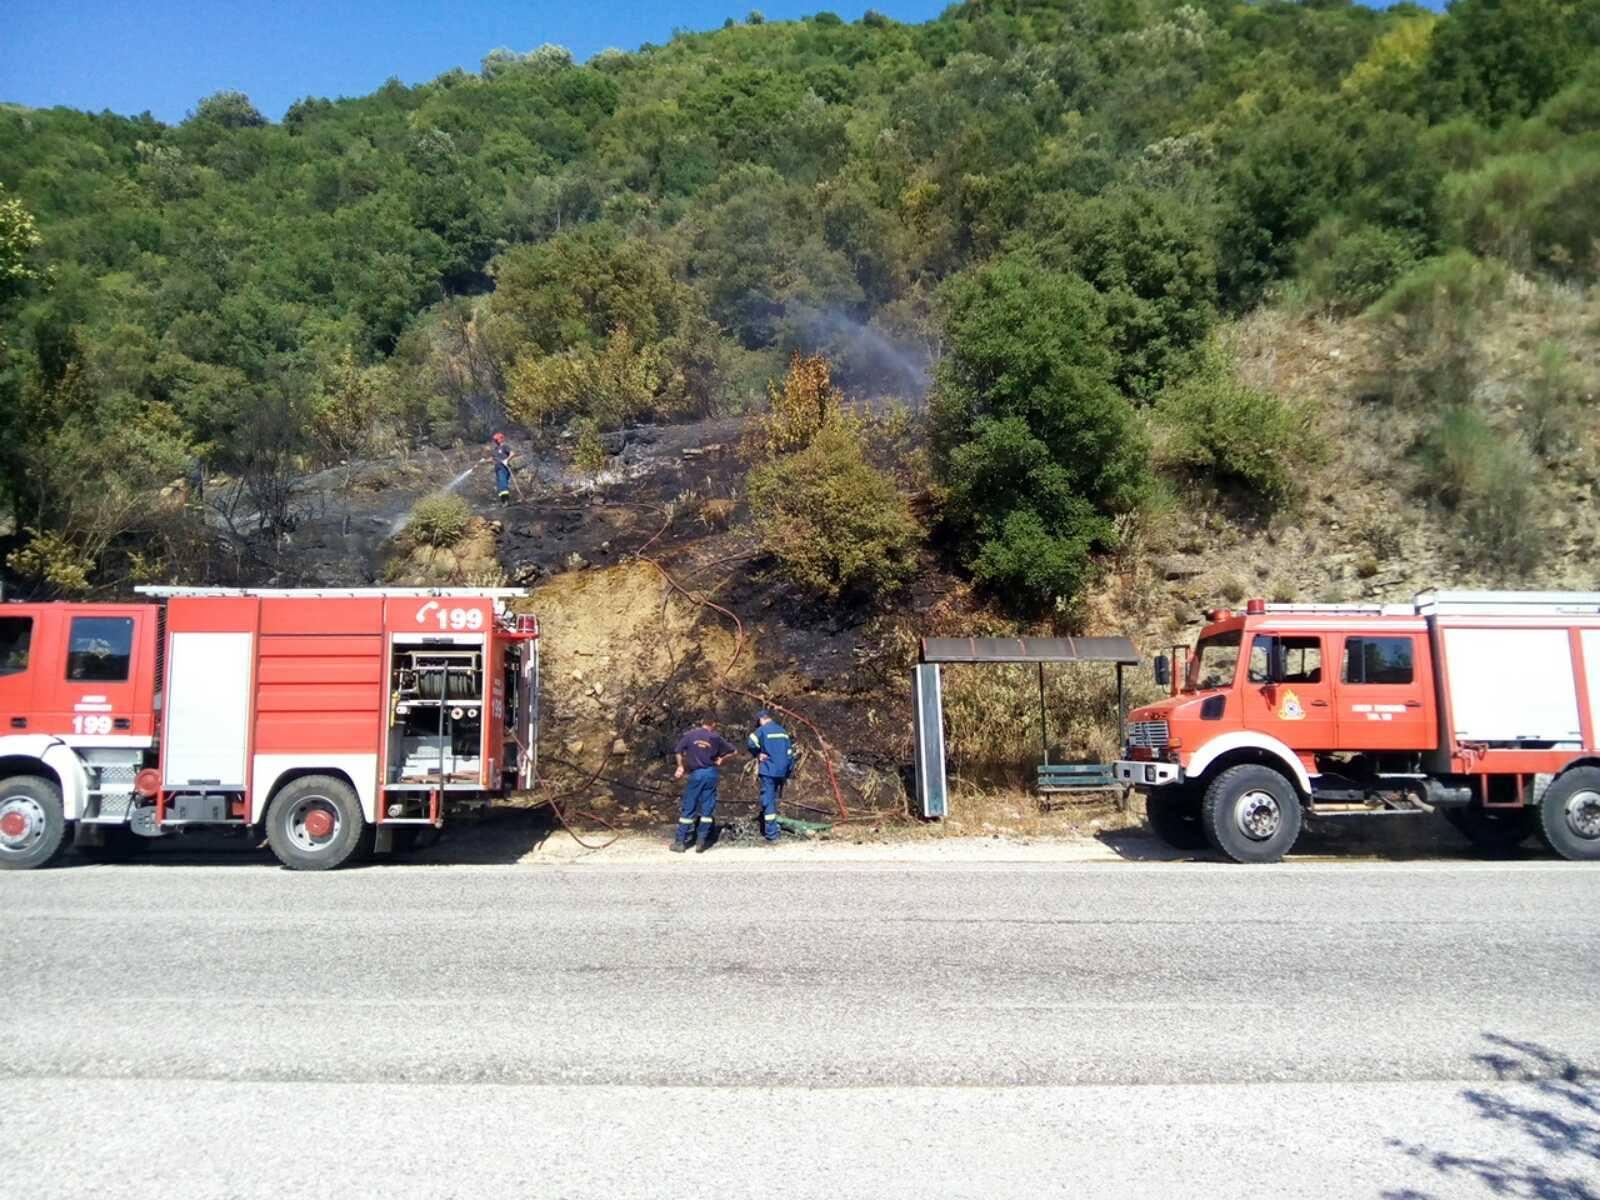 Mάχη με τις φλόγες σε δασική έκταση στα Φραγκουλέικα- Ενδείξεις για εμπρησμό